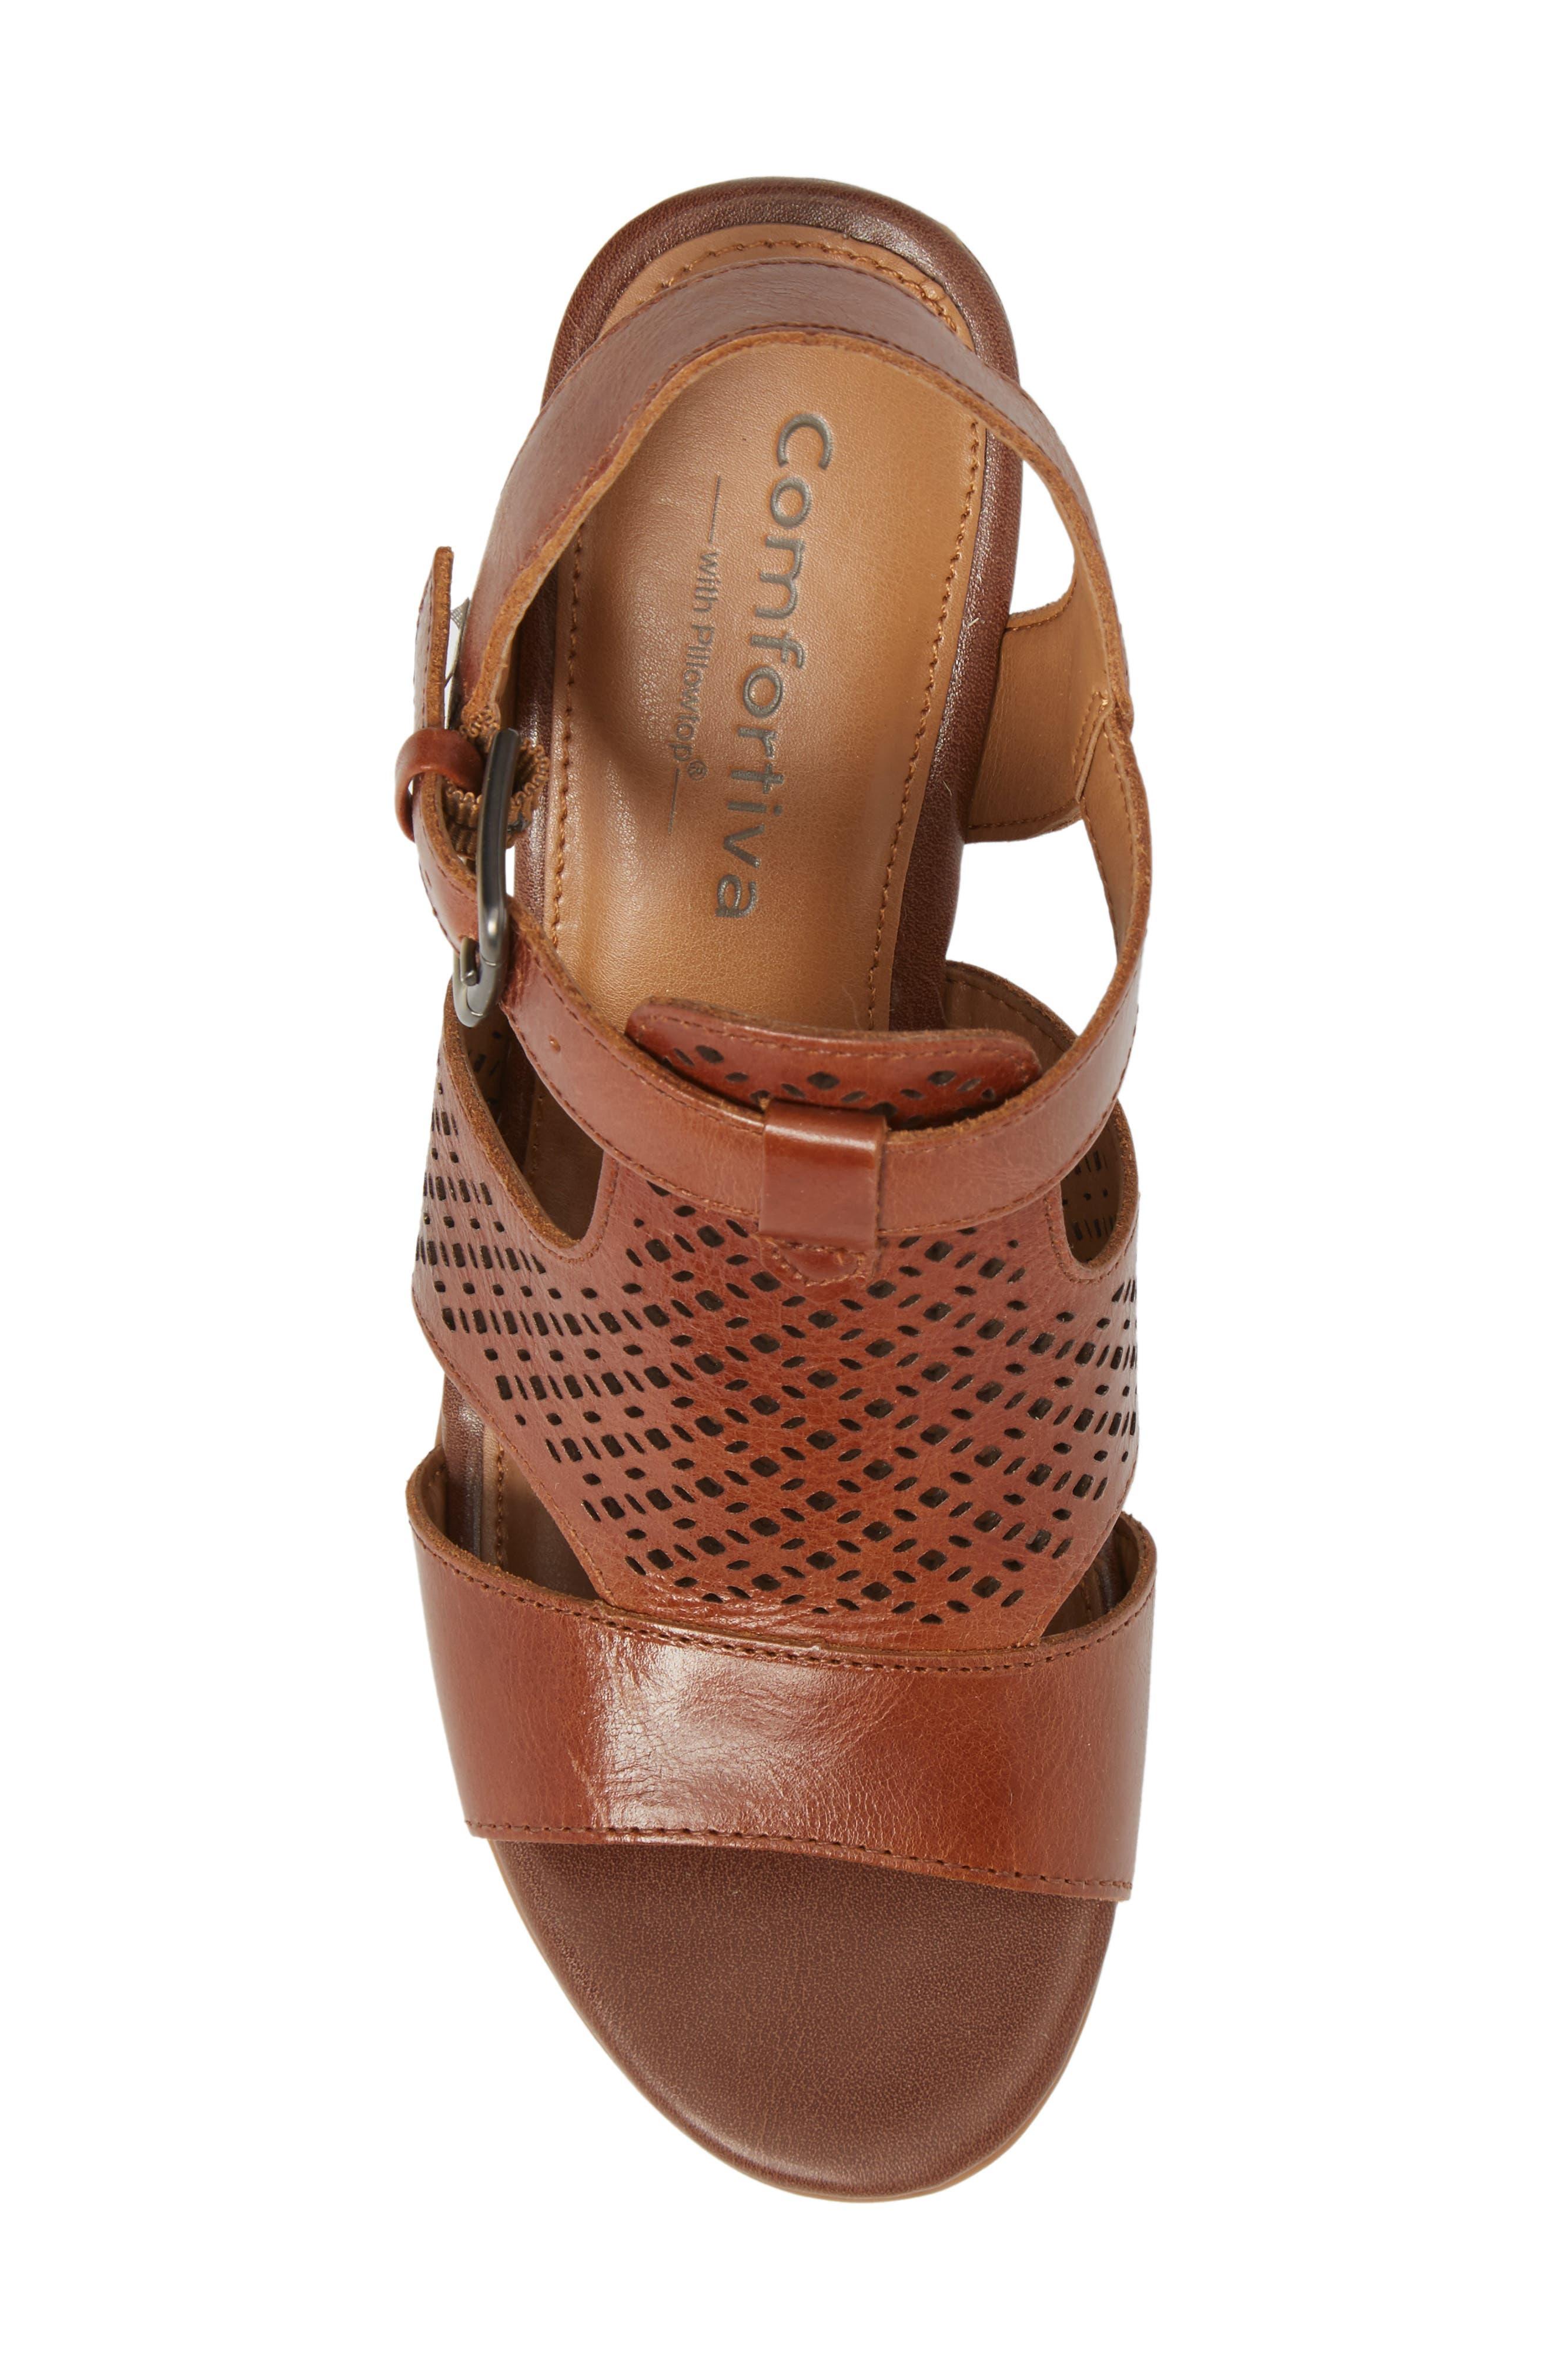 Amber Perforated Block Heel Sandal,                             Alternate thumbnail 5, color,                             Luggage Leather